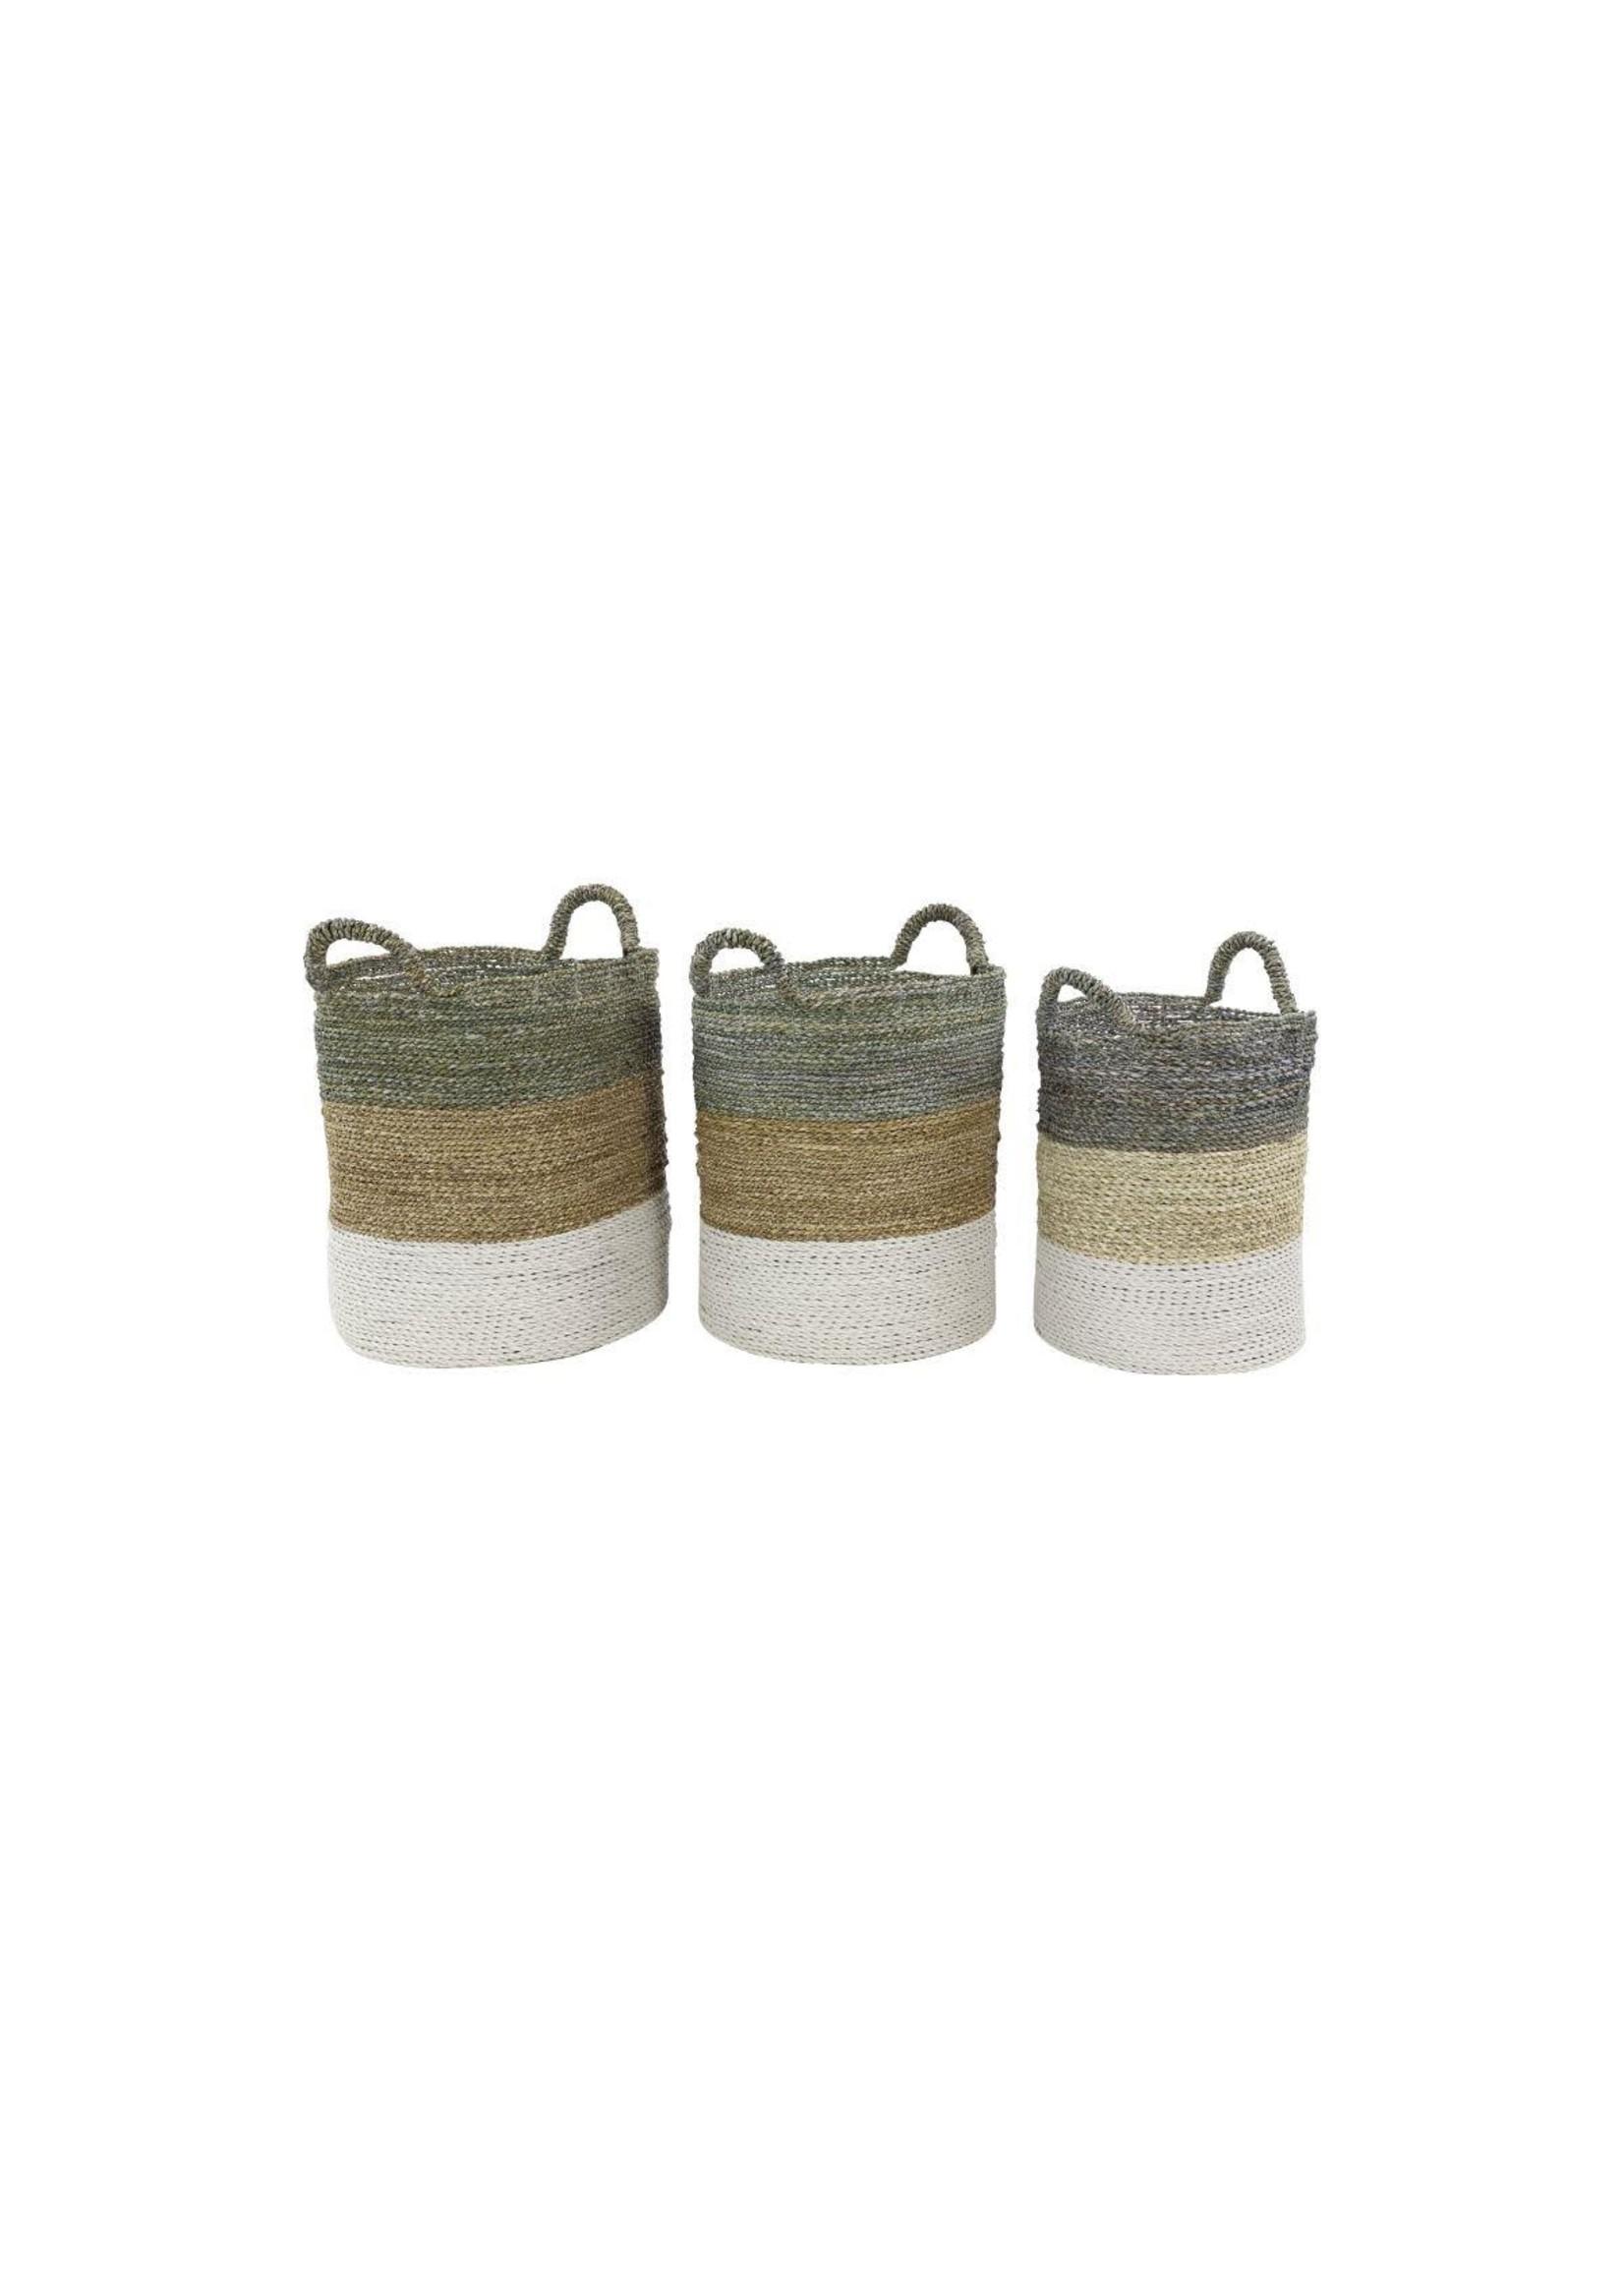 UMA Enterprises UMA Seagrass Basket LARGE